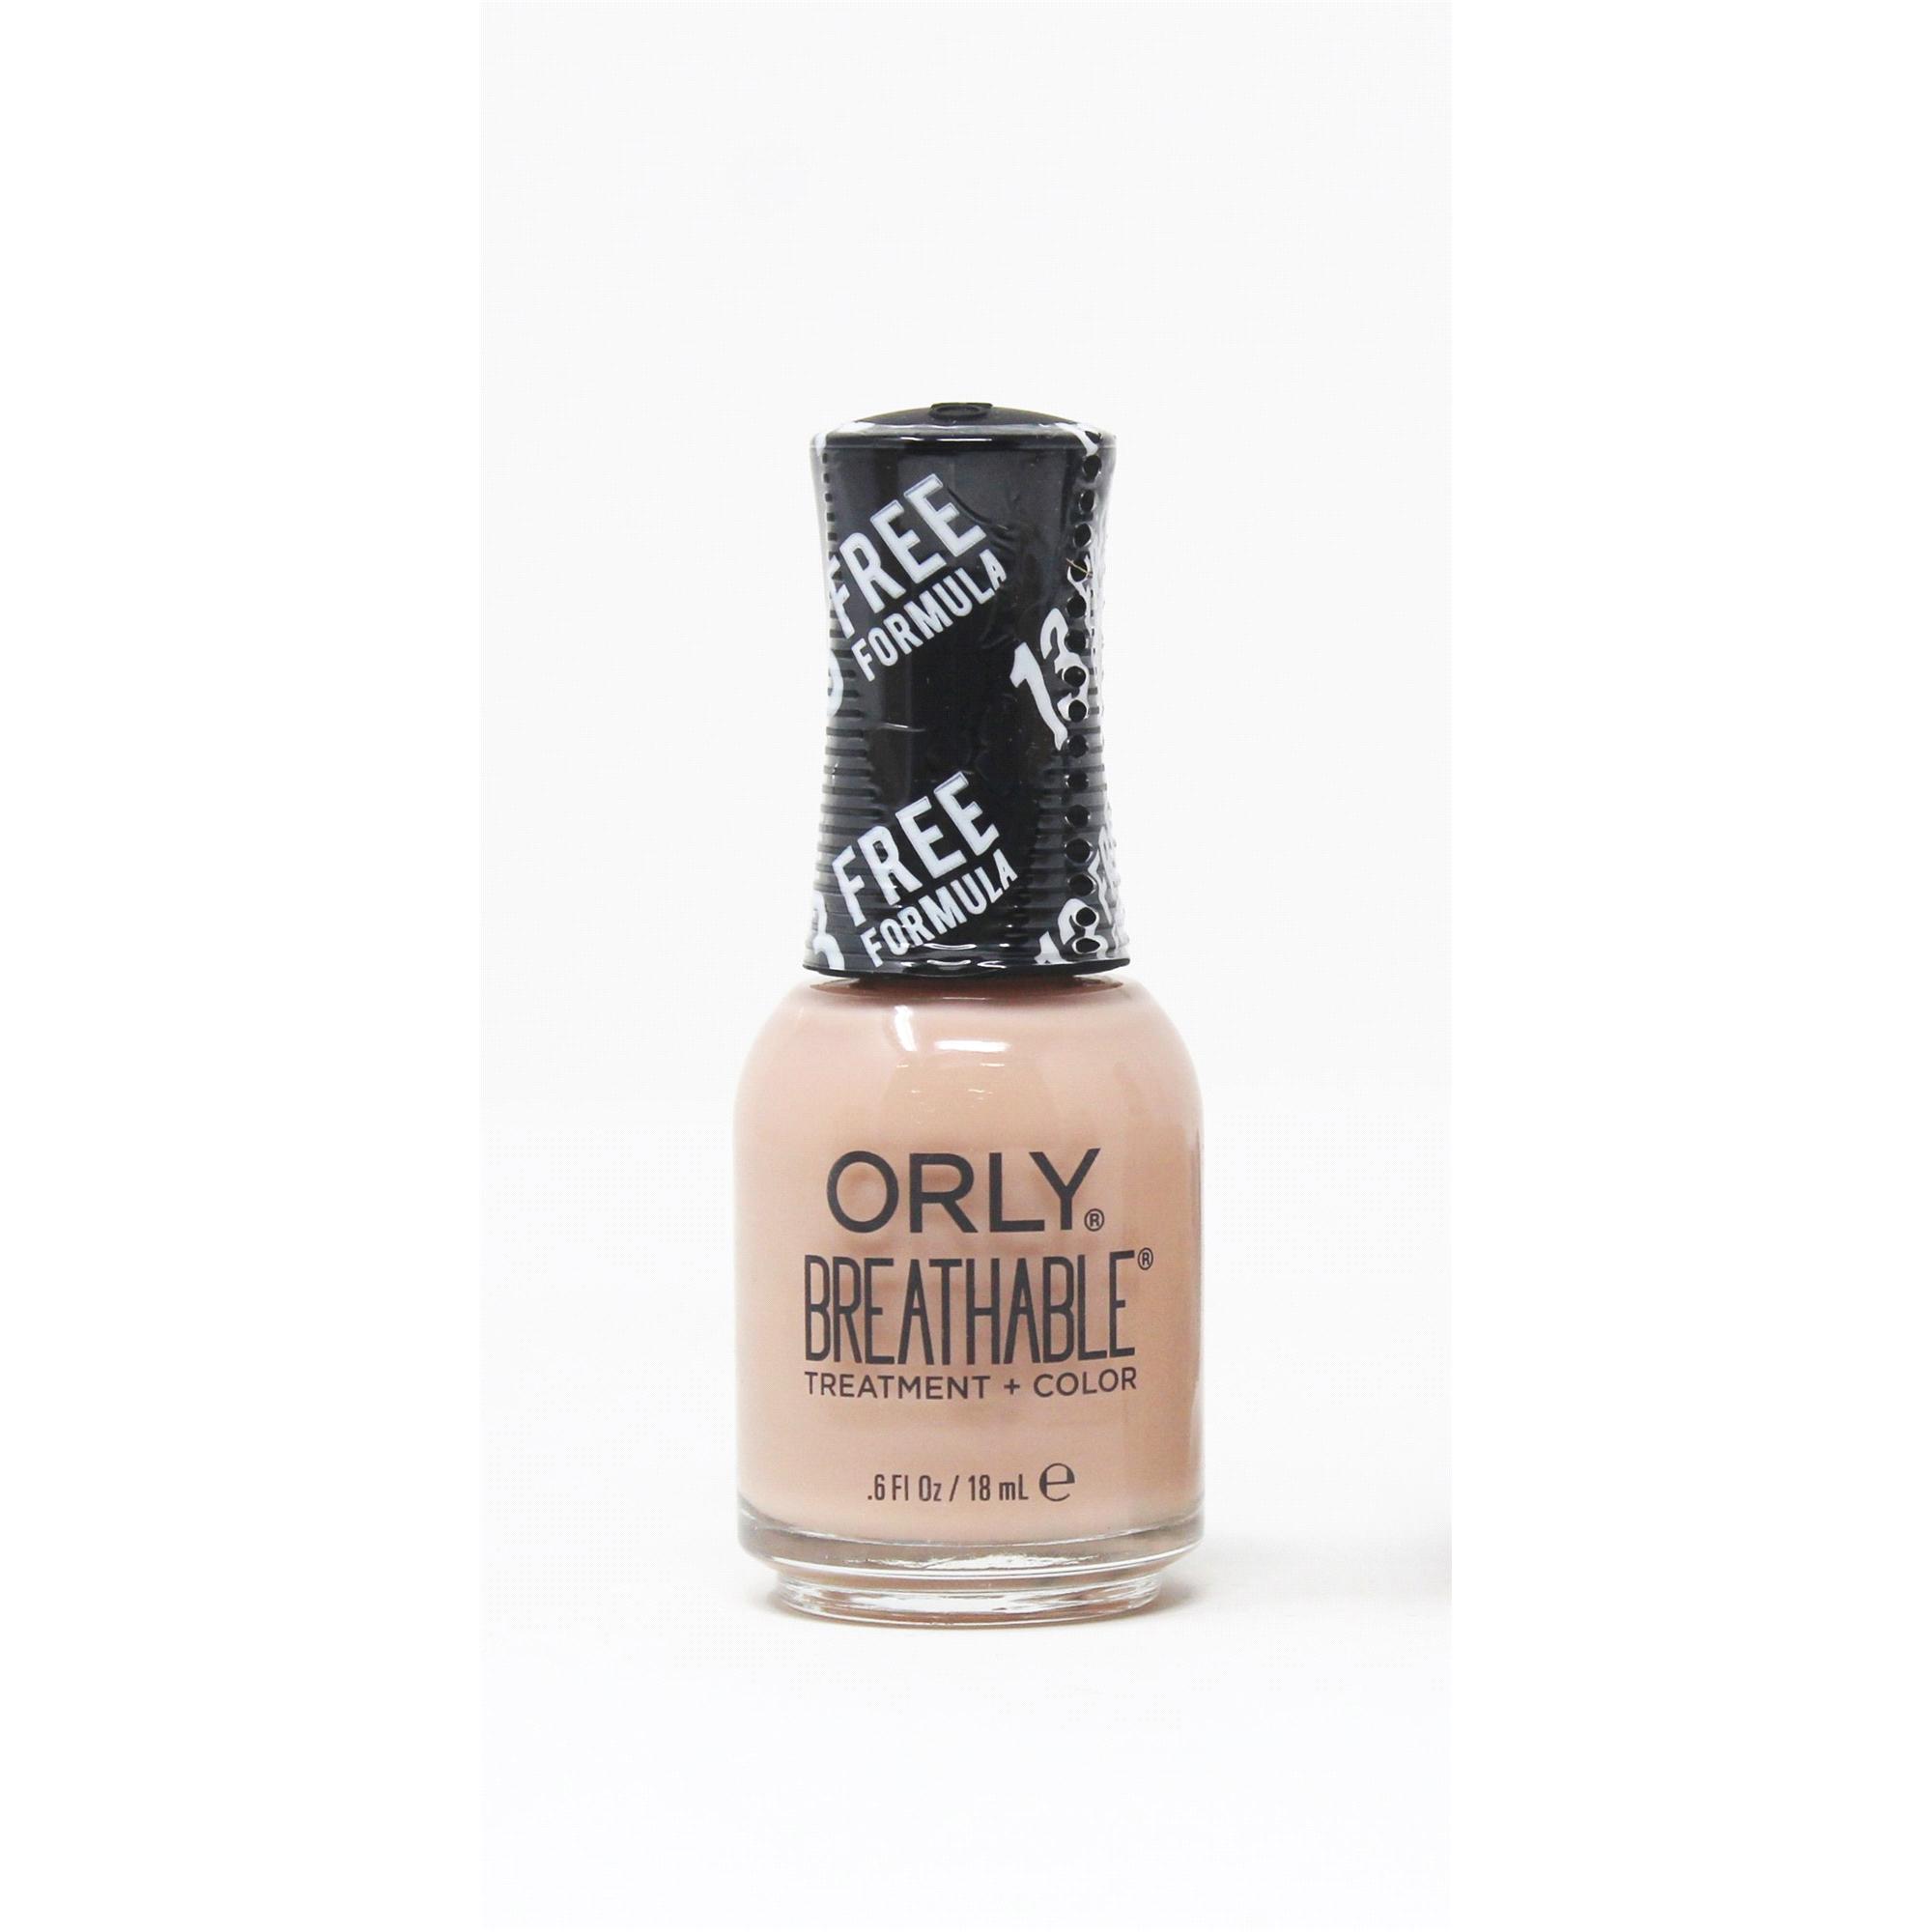 ORLY Breathable Nail Polish Nourishing Nude | LOVERTE